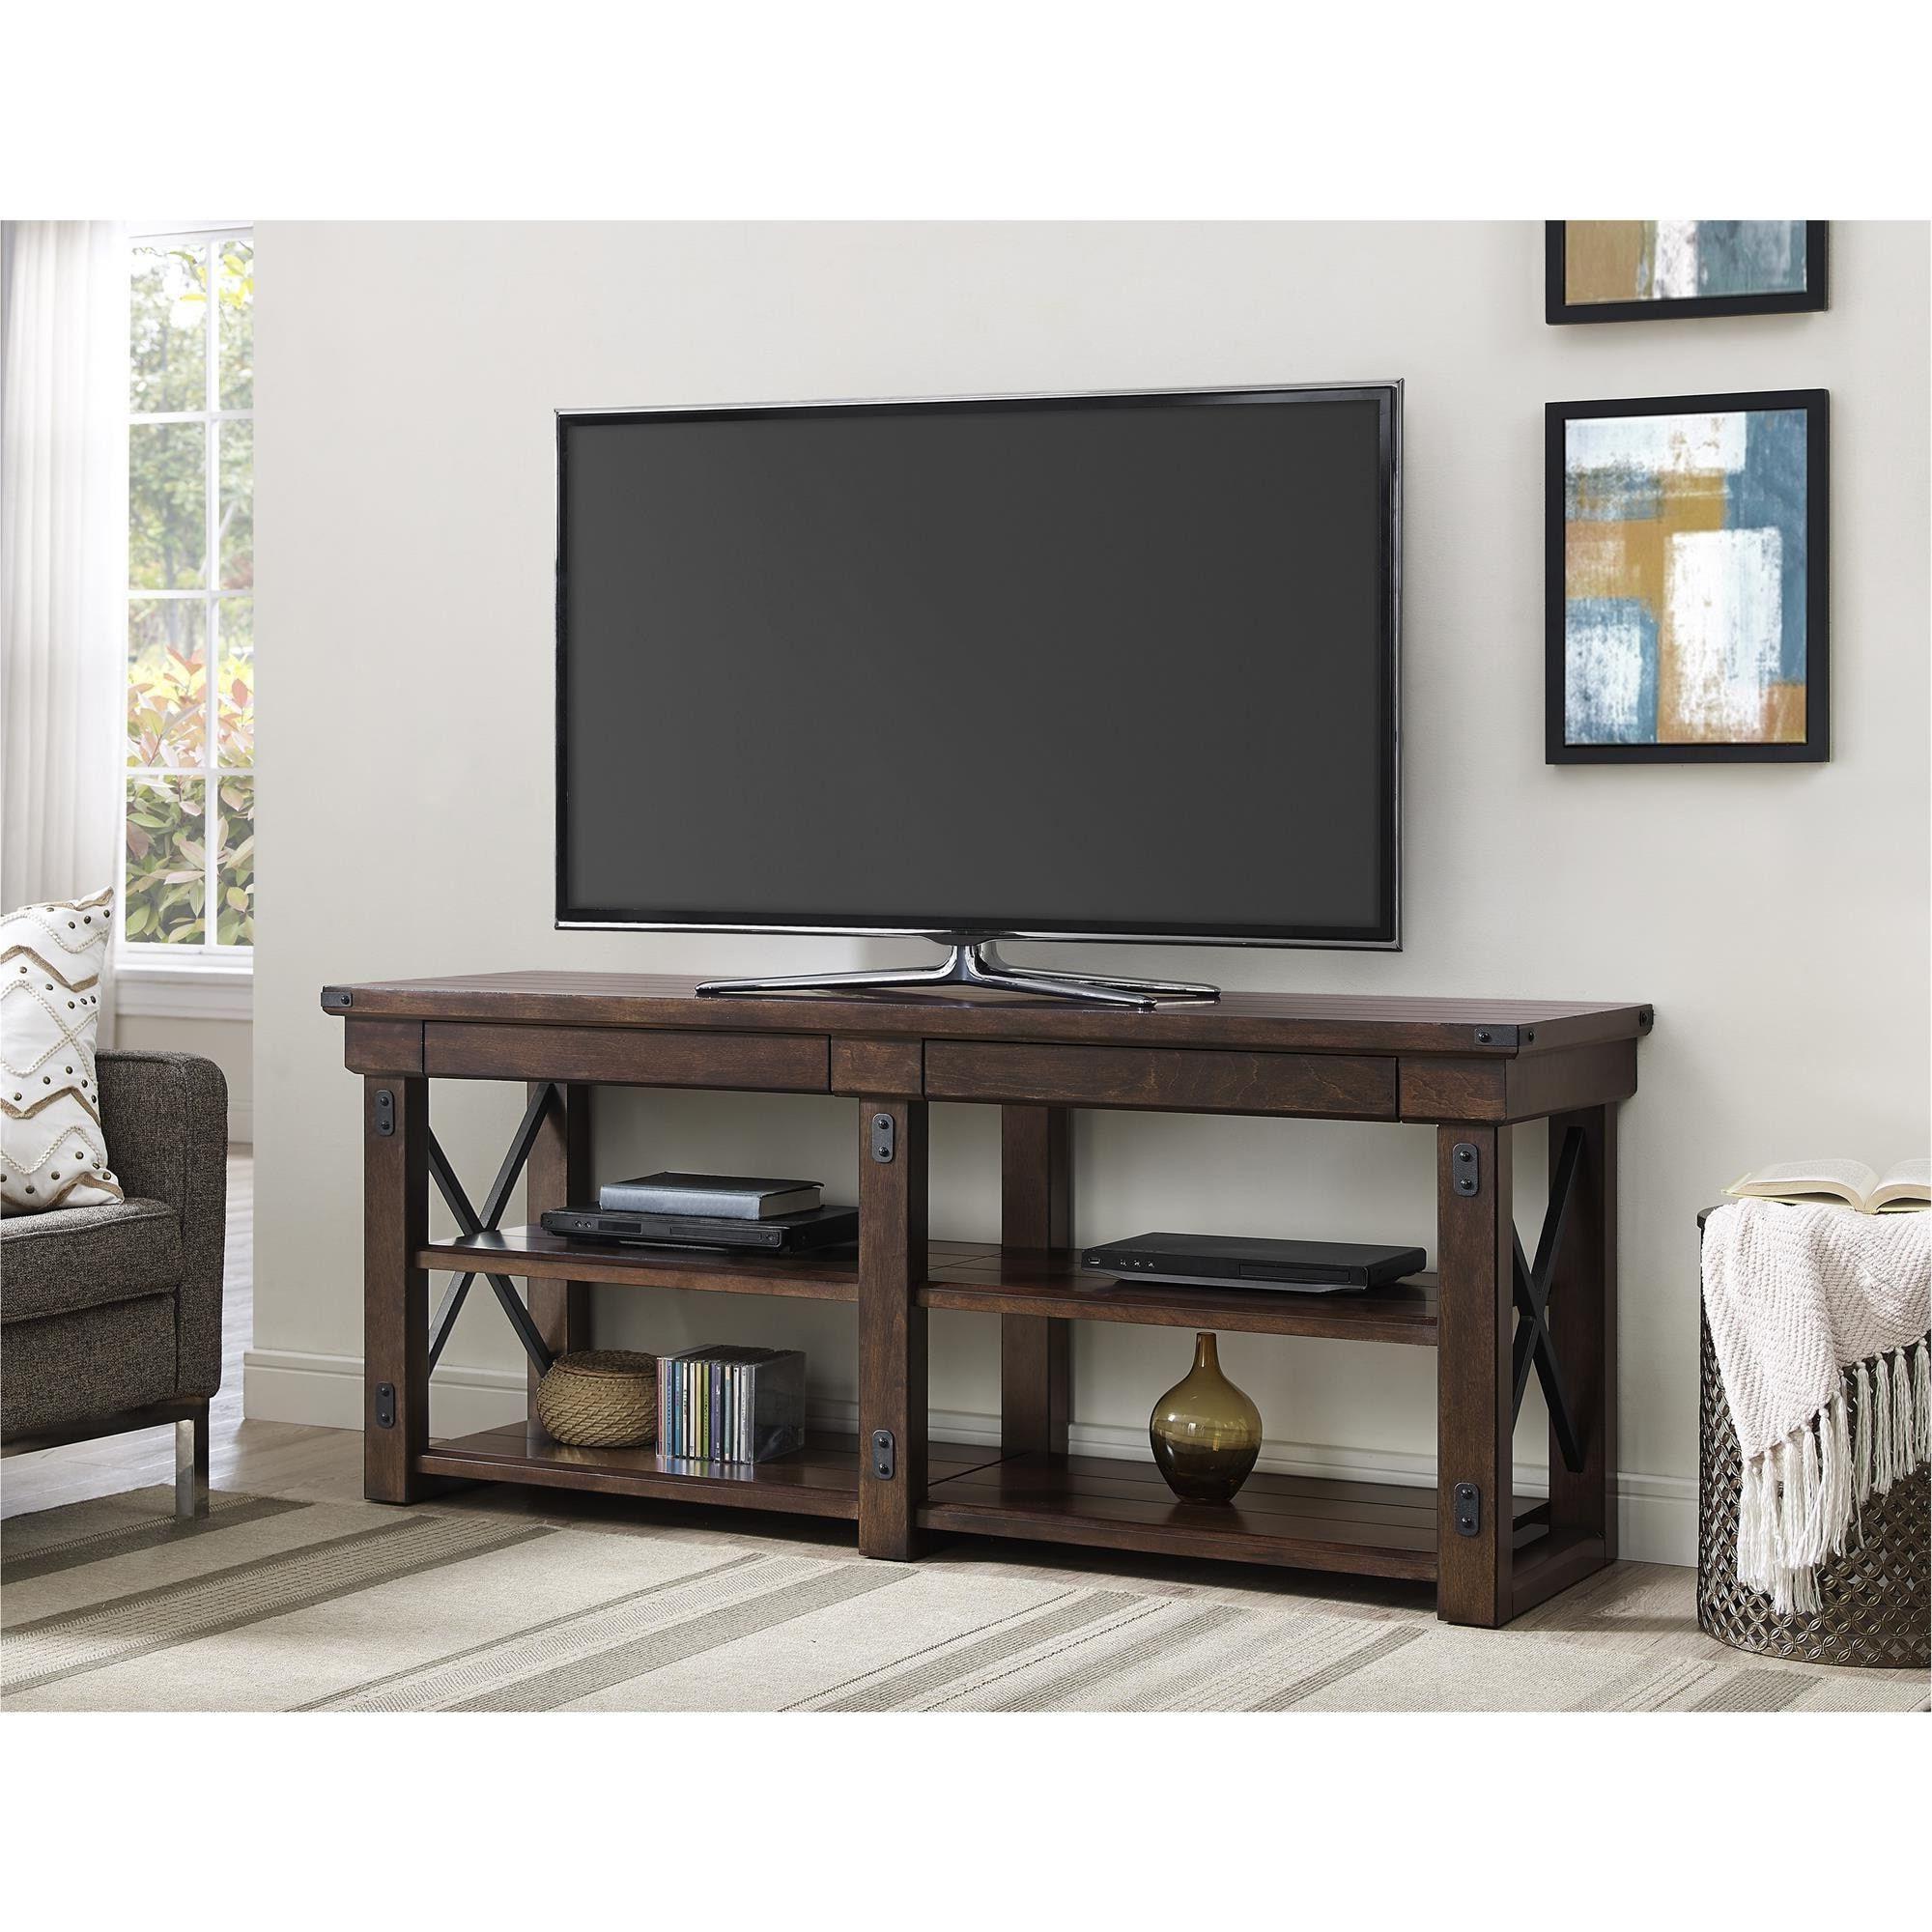 Ameriwood Home Wildwood Mahogany Veneer 65 Inch Tv Stand (65 Inch Tv Within Kenzie 72 Inch Open Display Tv Stands (View 8 of 20)